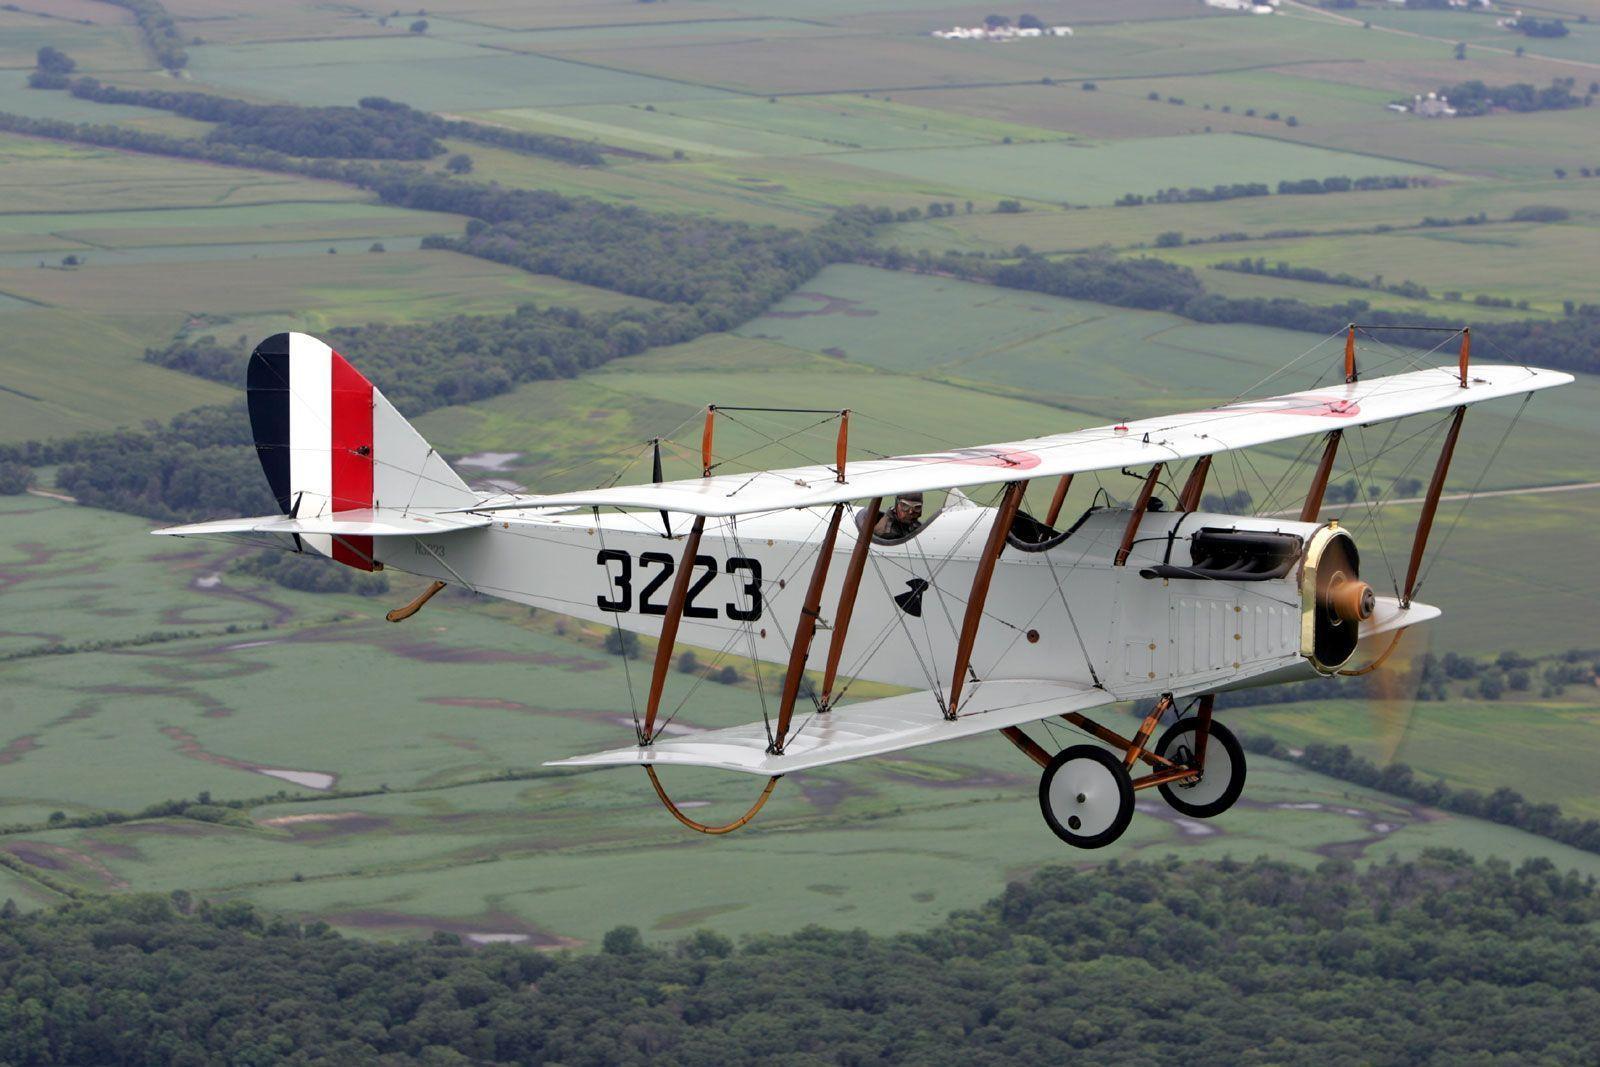 Vintage Airplane Wallpapers 1600x1067